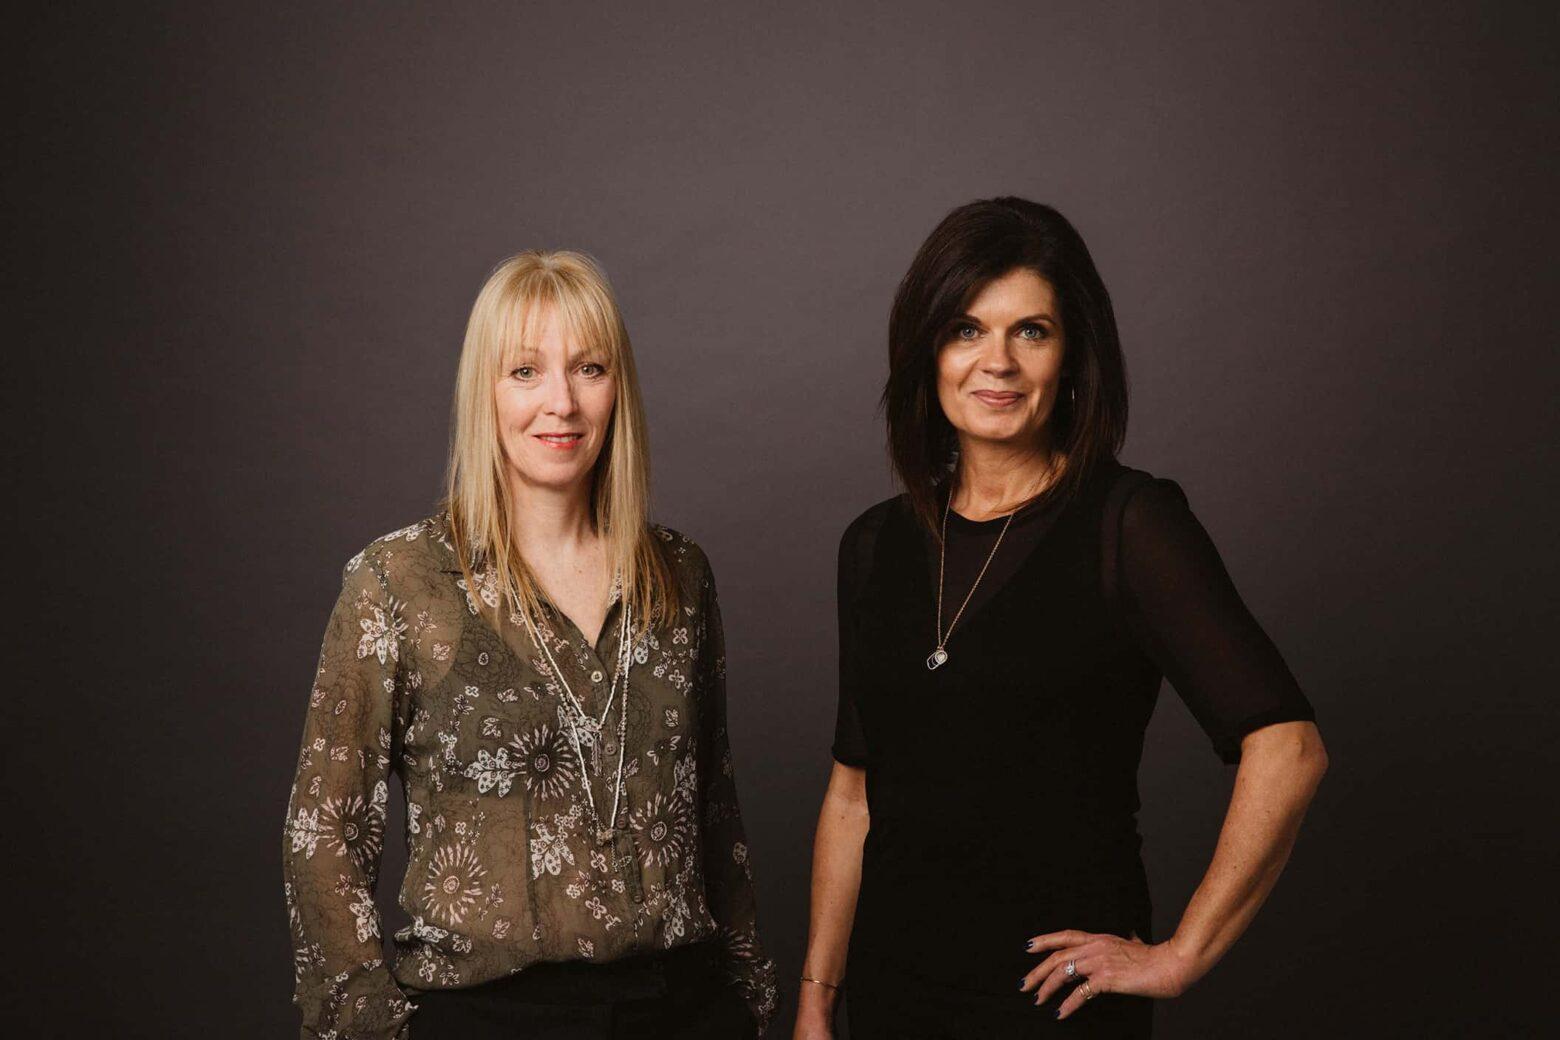 Victoria Swift and Sandra Ewart of V.S. Creative